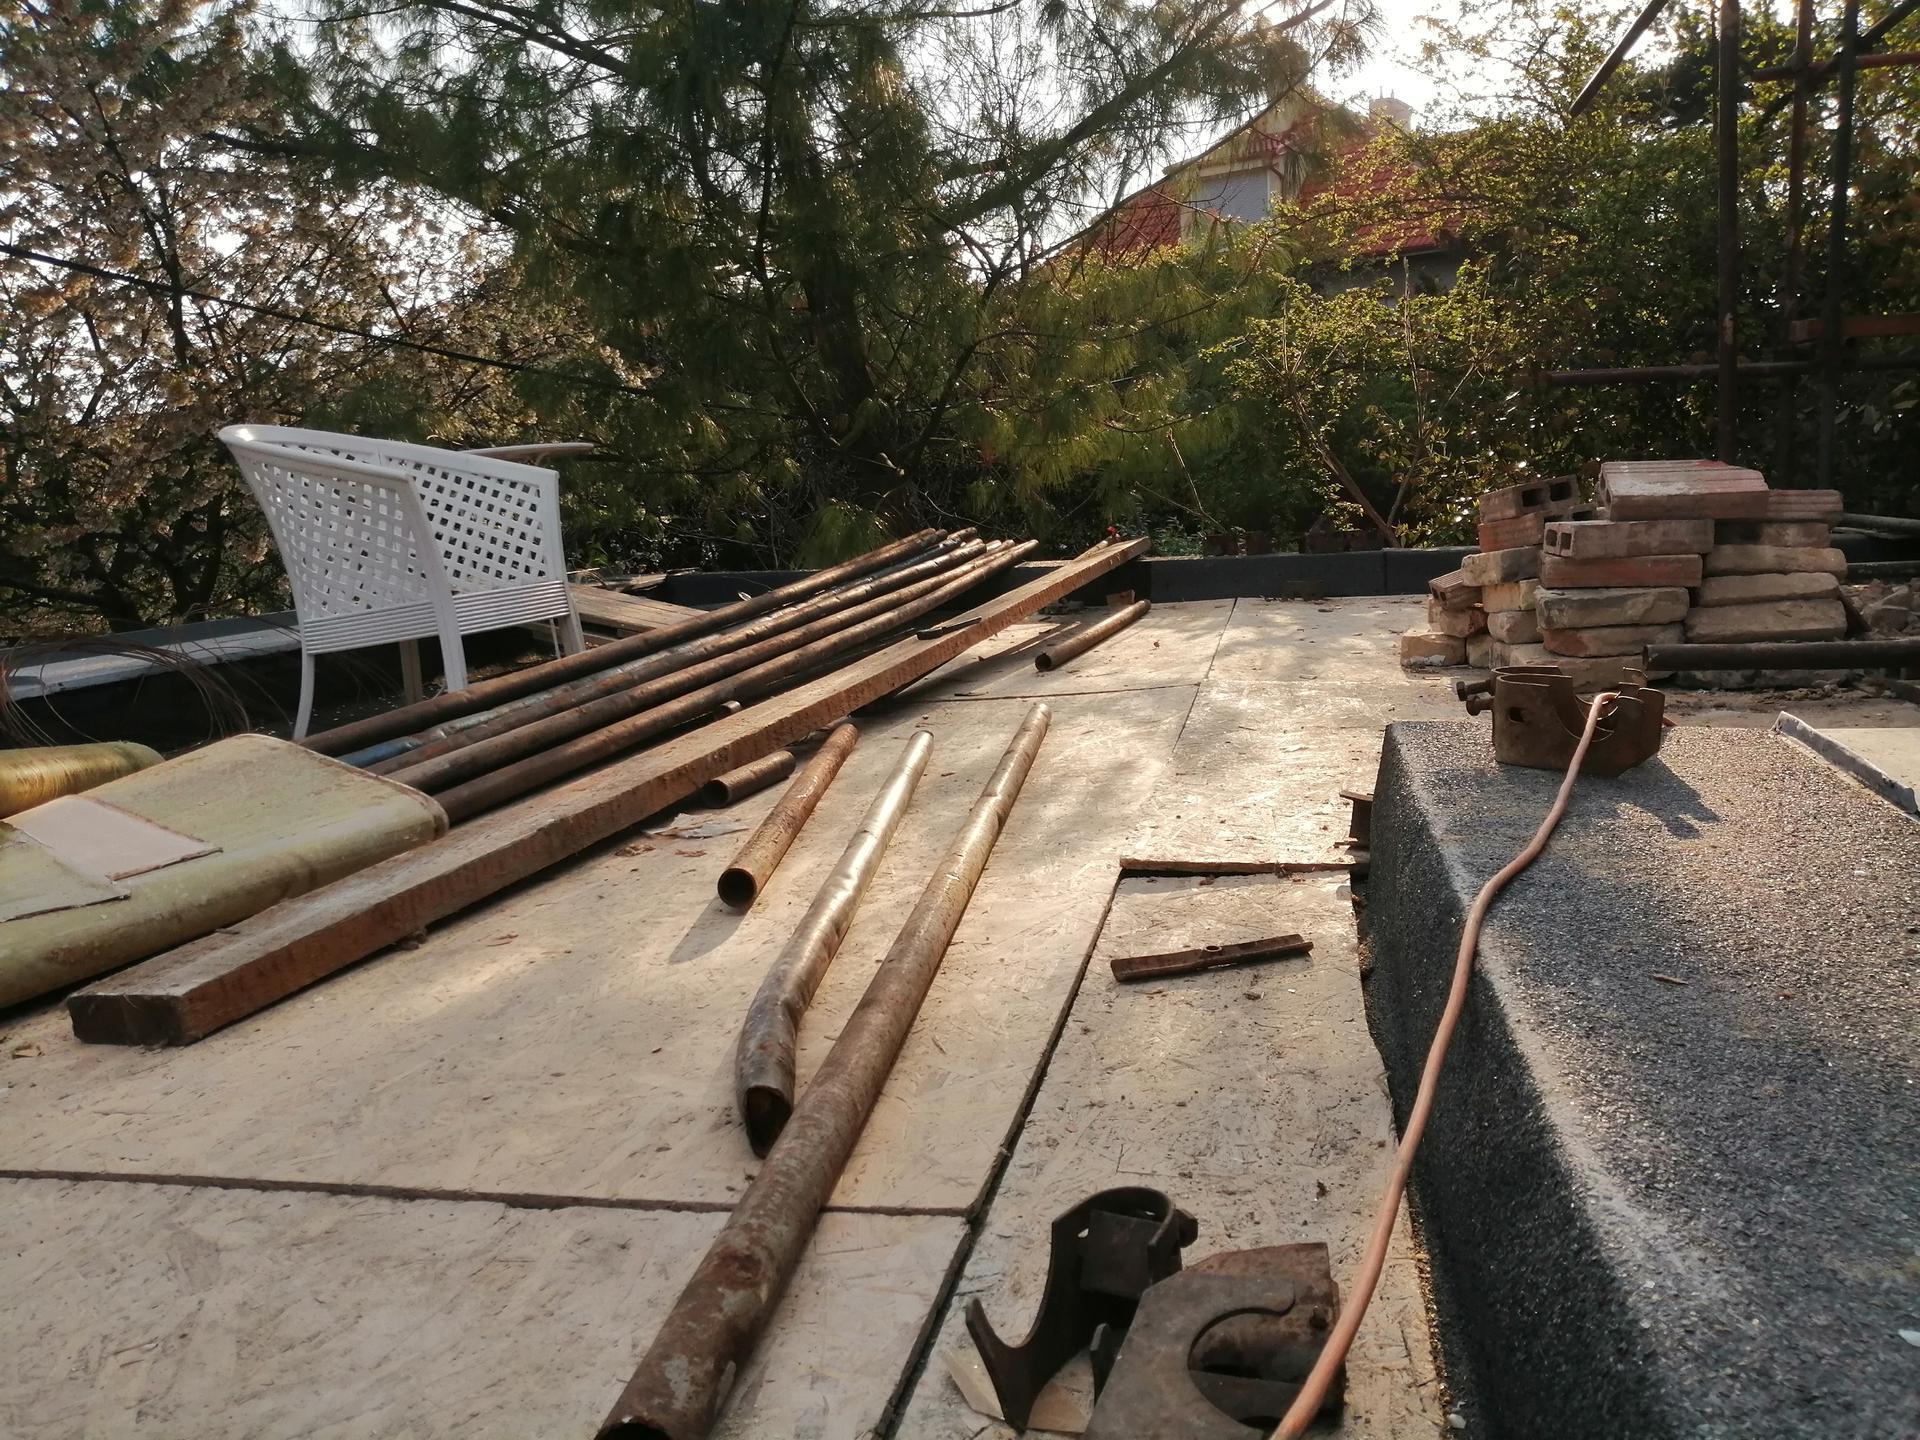 Prestavba podkrovia zo sedlovo valbovej na sedlovú strechu. - Obrázok č. 16